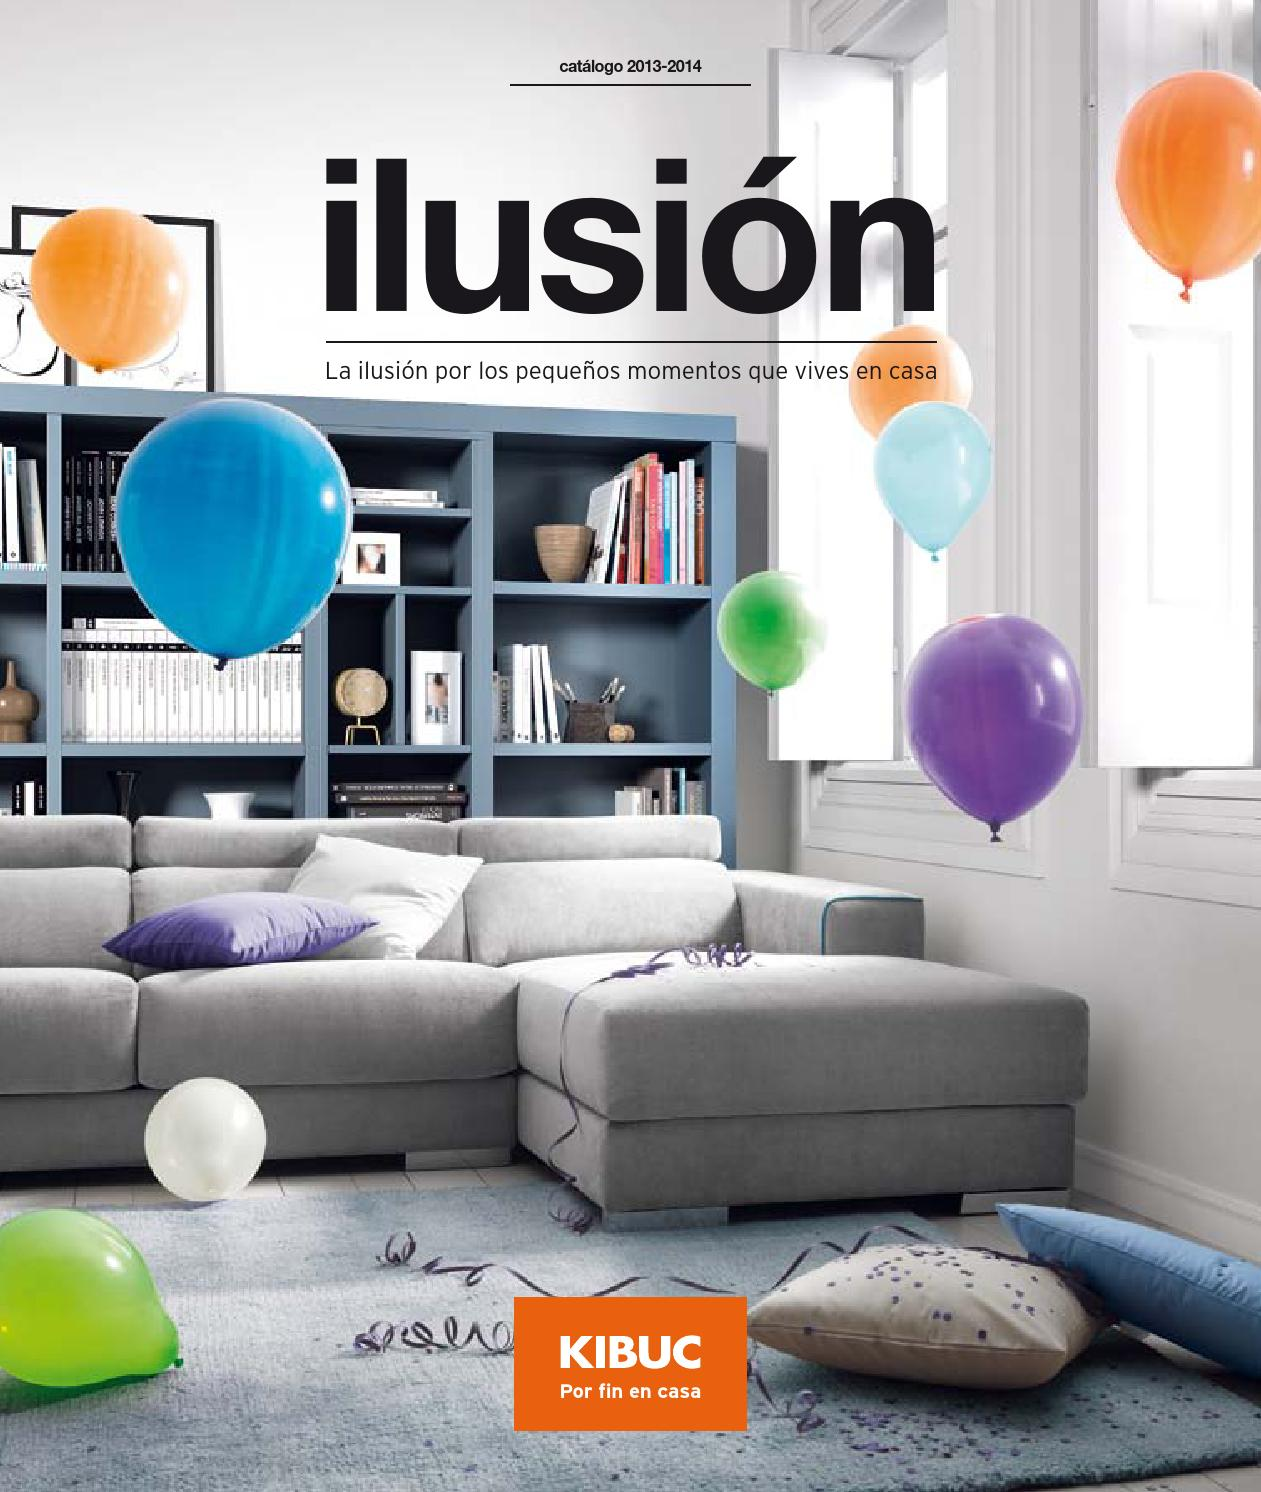 muebles-kibuc-catalogo-2014 by Milyuncatalogos.com - issuu